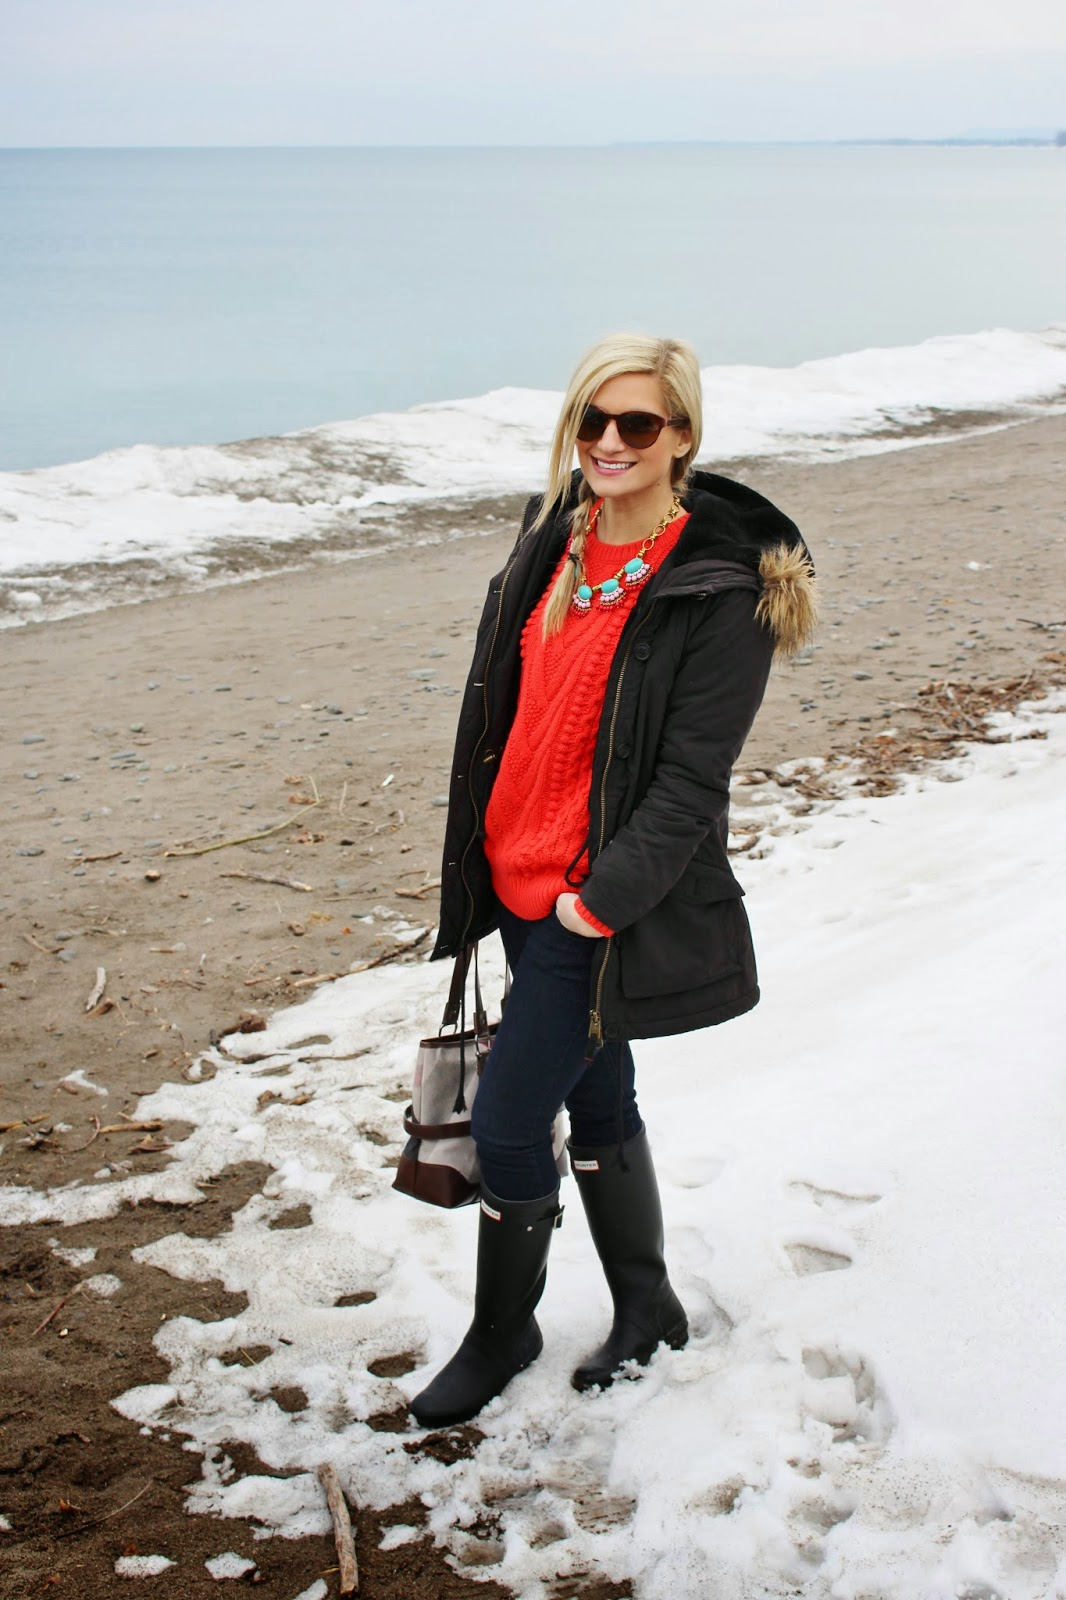 bijuleni - parka coat and jeans